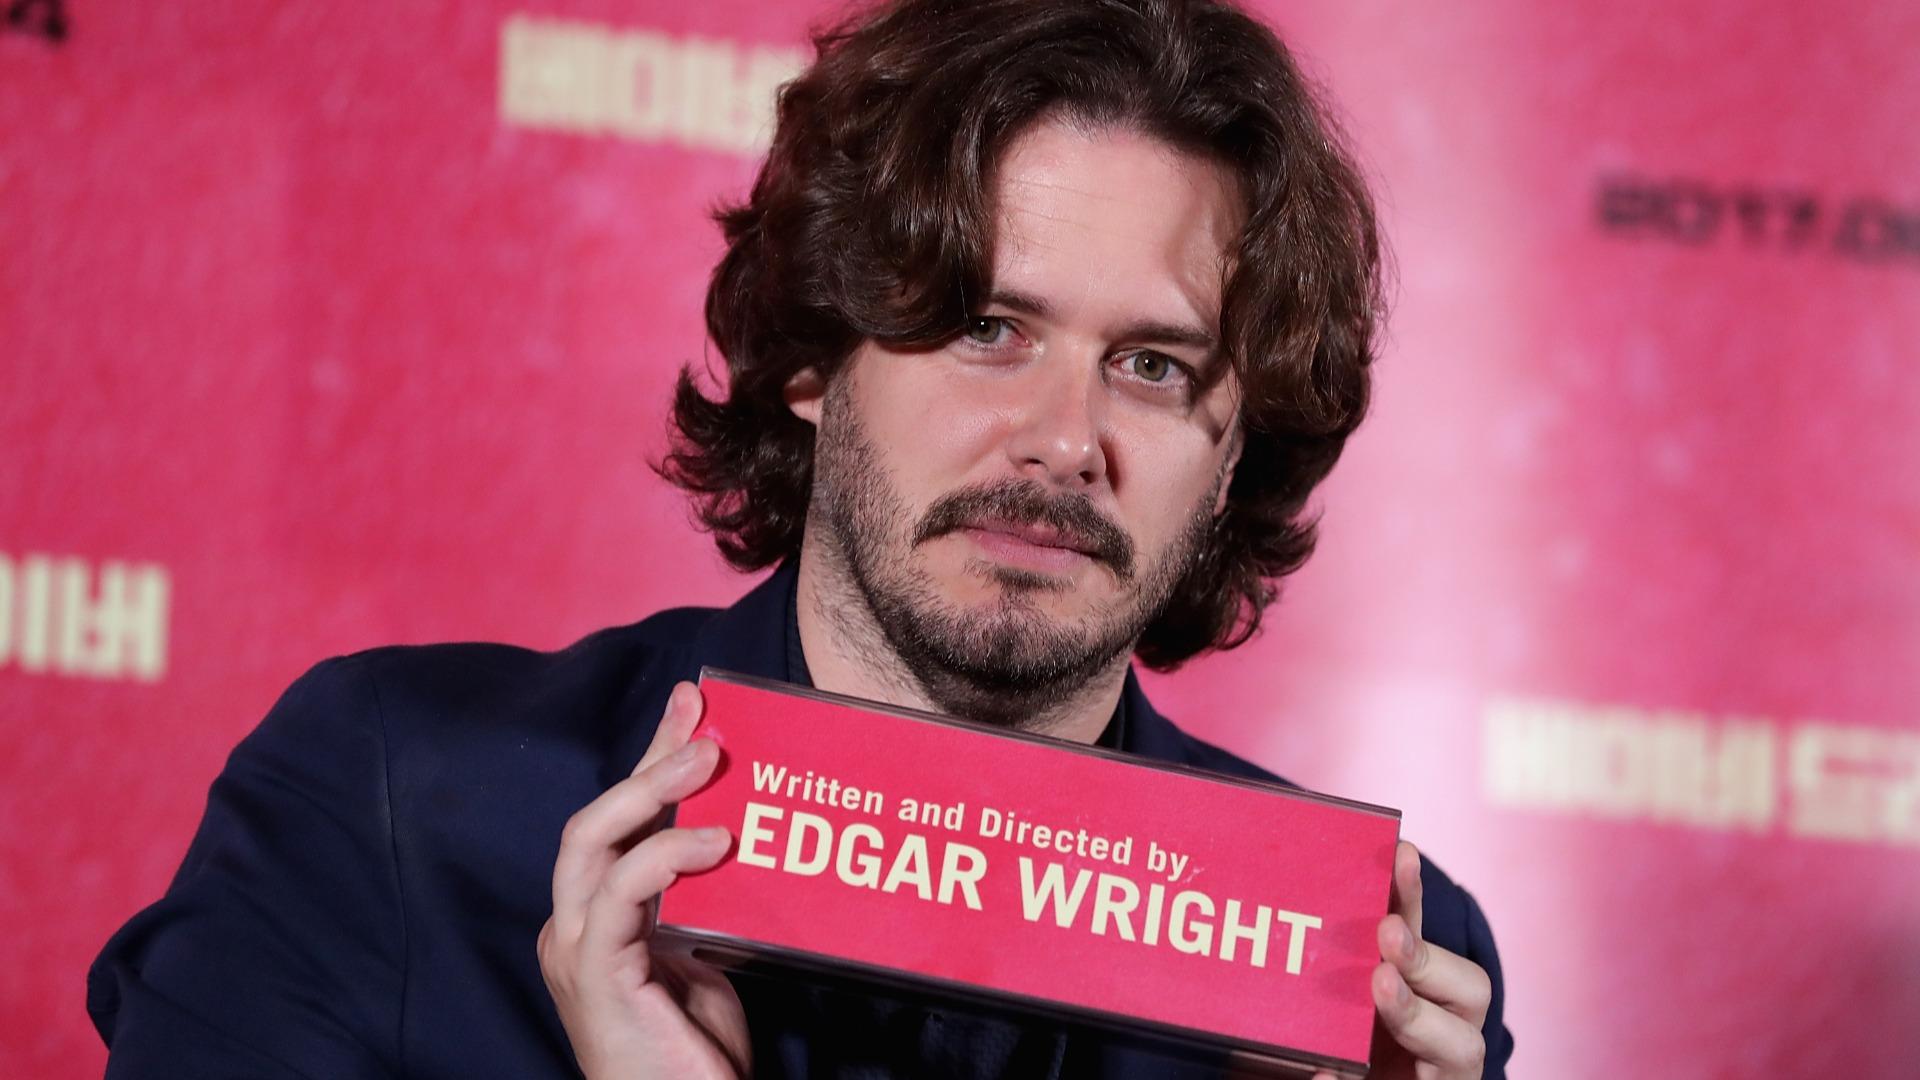 Edgar Wright and X-Men writer Jane Goldman team up for kidnap ...